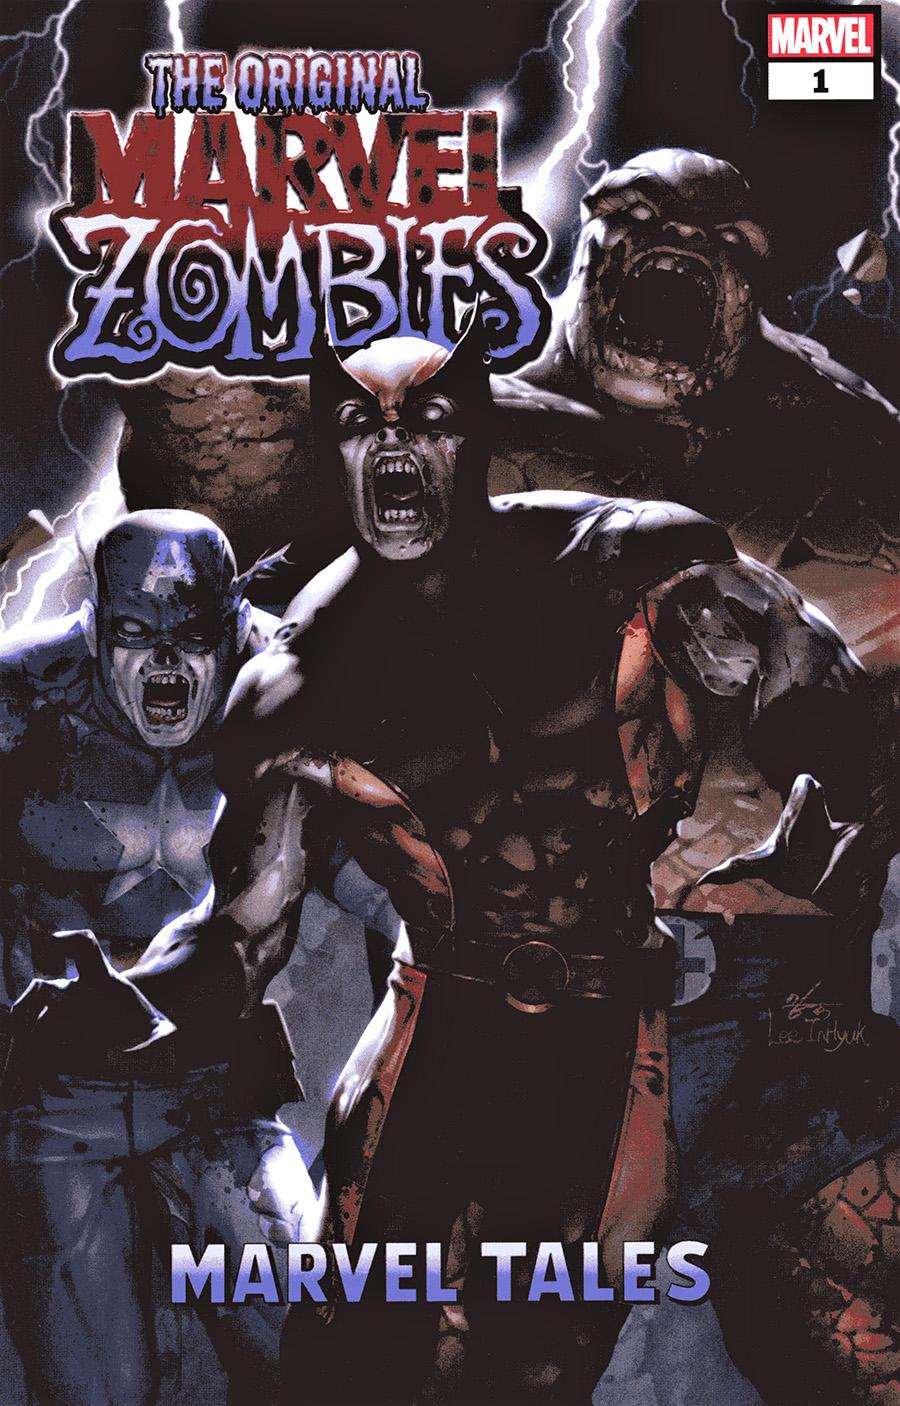 Original Marvel Zombies Marvel Tales #1 Cover A Regular Inhyuk Lee Cover